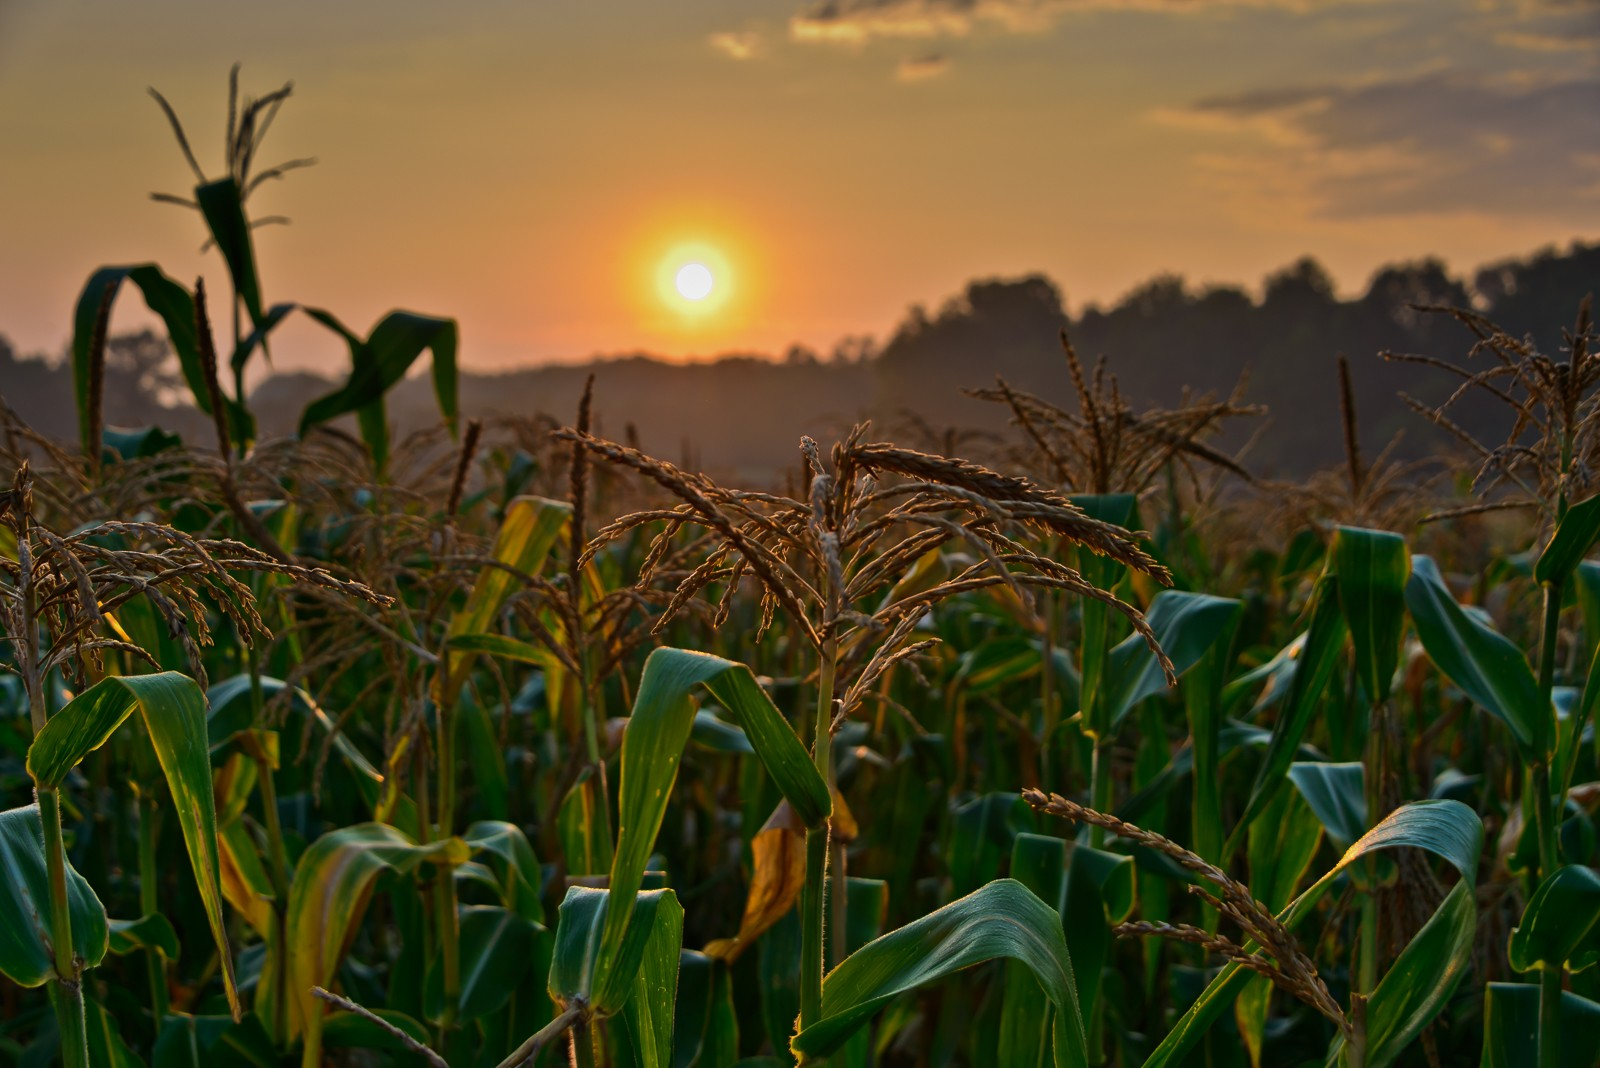 corn-stalks-5002